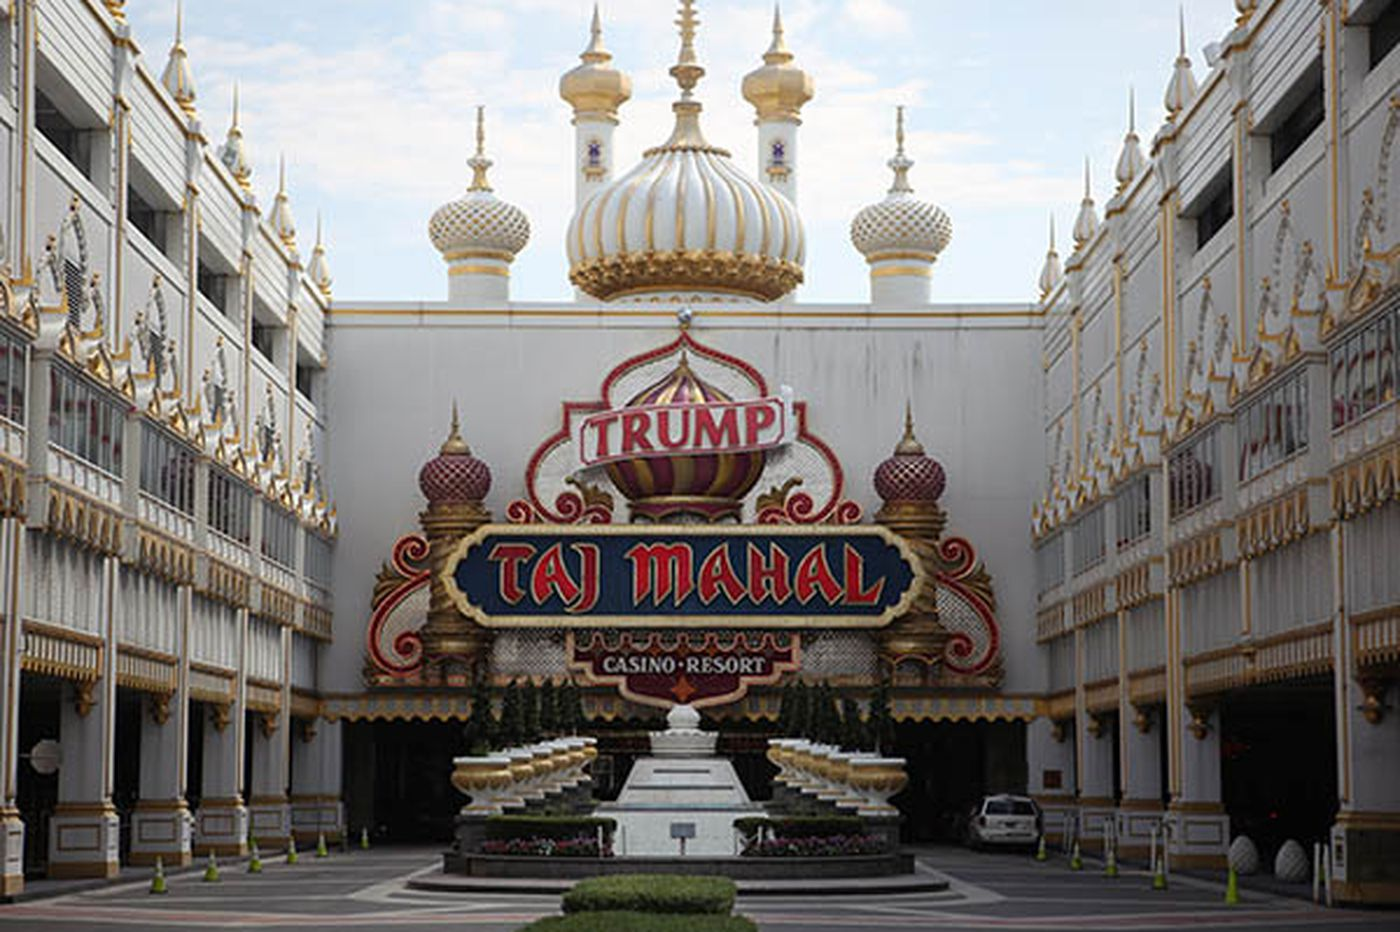 Taj Mahal seeks exit from union pension plan